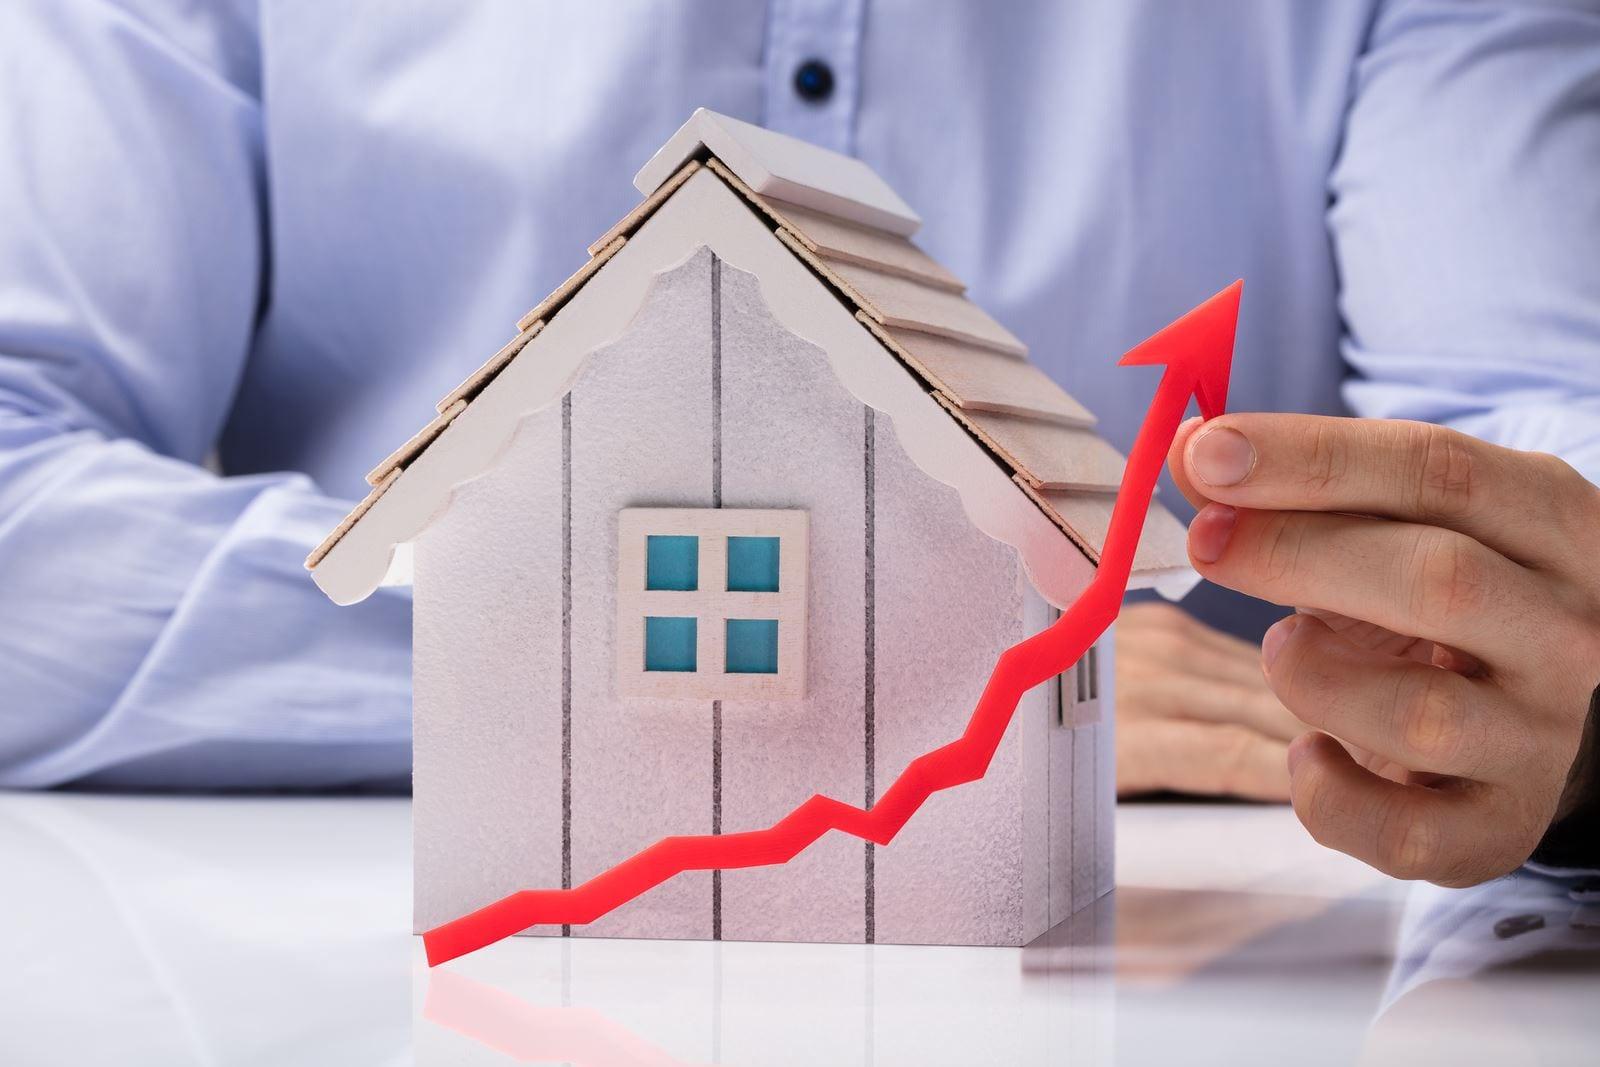 Dallas housing market